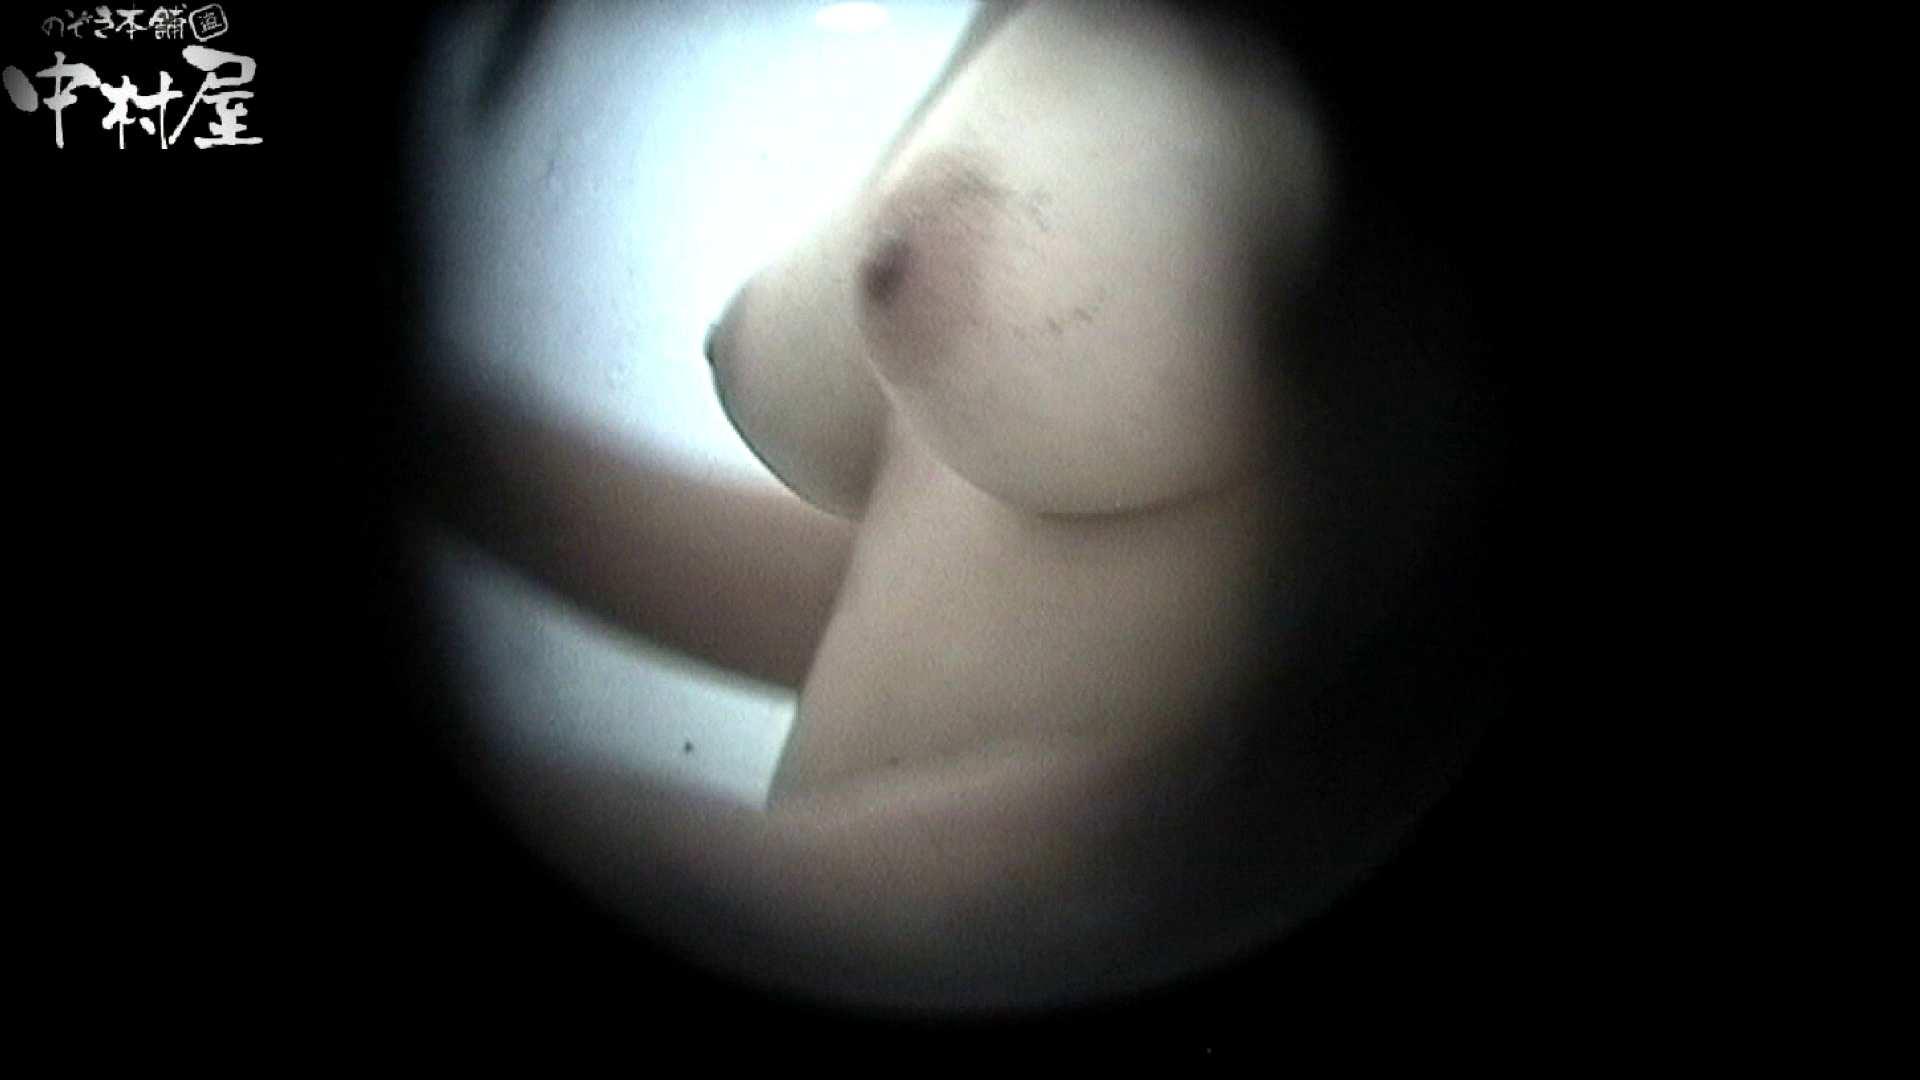 No.46 マシュマロ巨乳が目の前でプルプル 巨乳 おめこ無修正画像 78連発 35